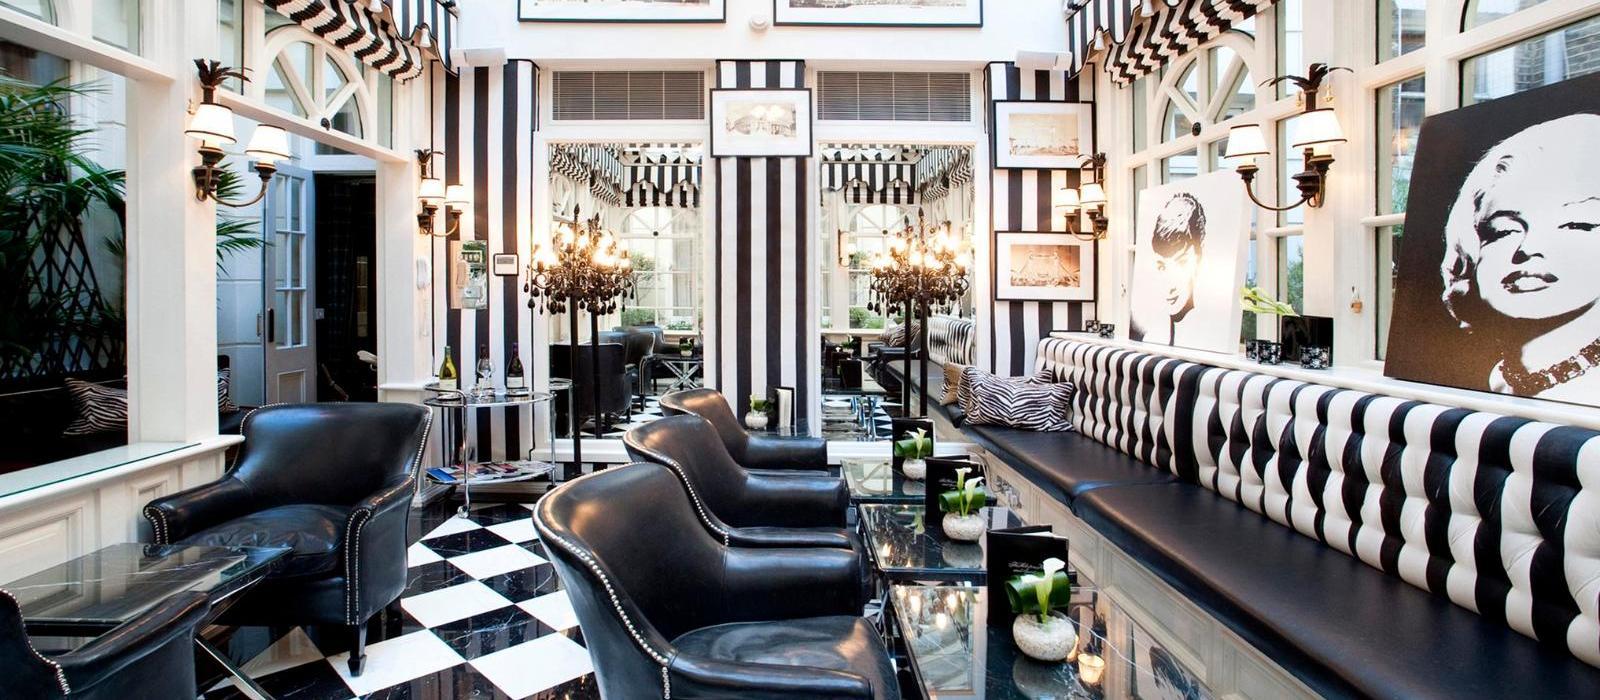 肯辛顿里程碑酒店(The Milestone Hotel & Residences) Conservatory餐厅图片  www.lhw.cn